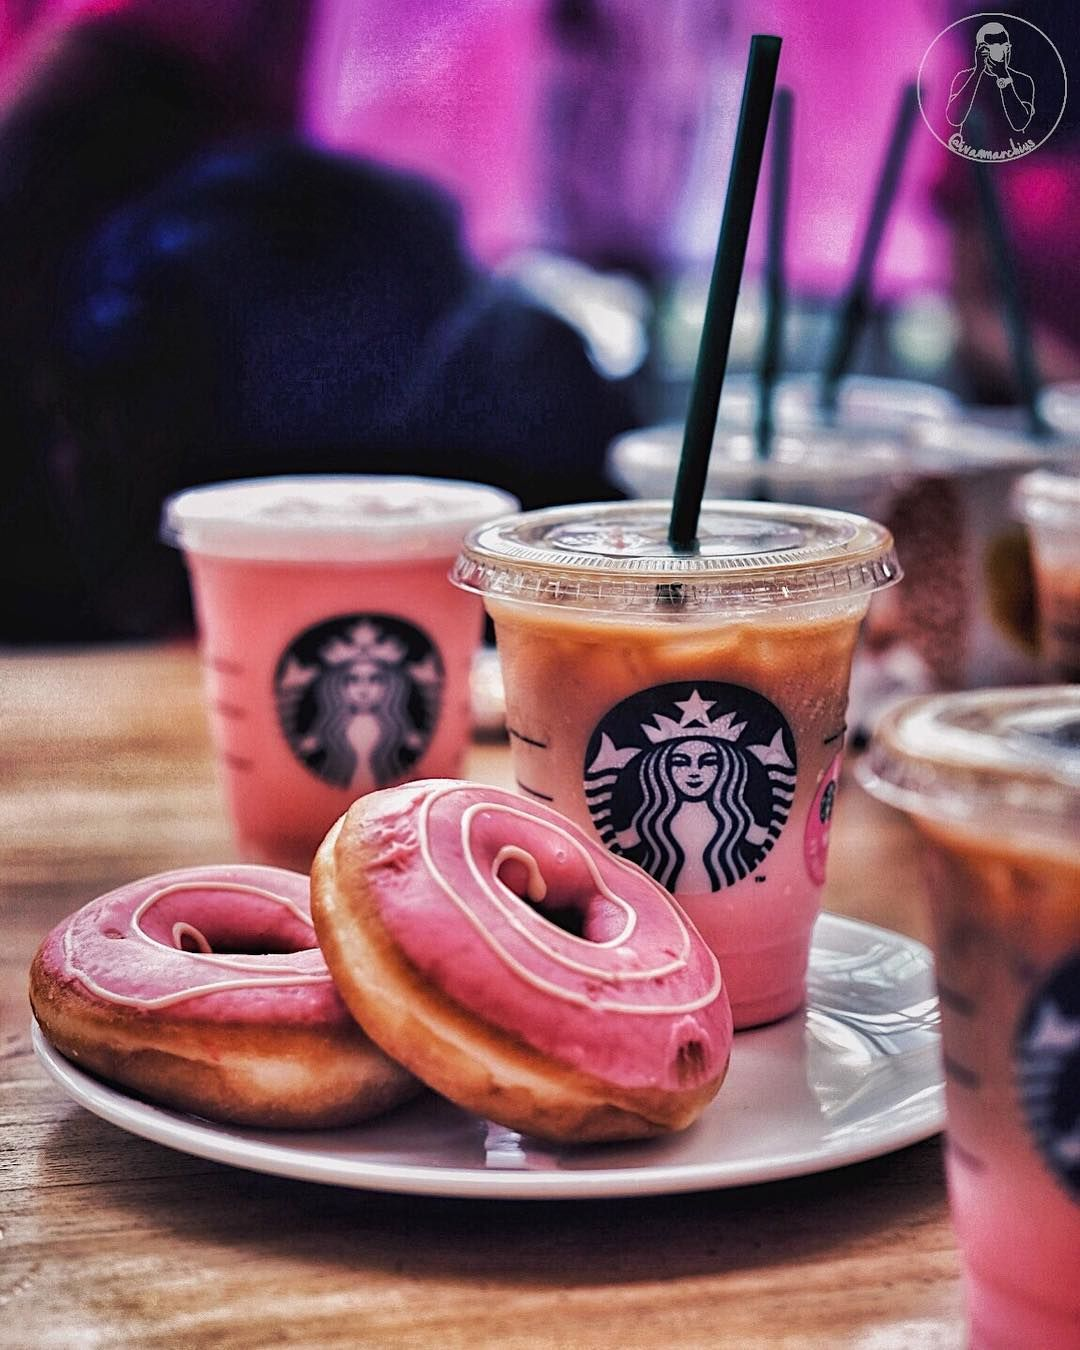 sweet warm coffee drinks at starbucks